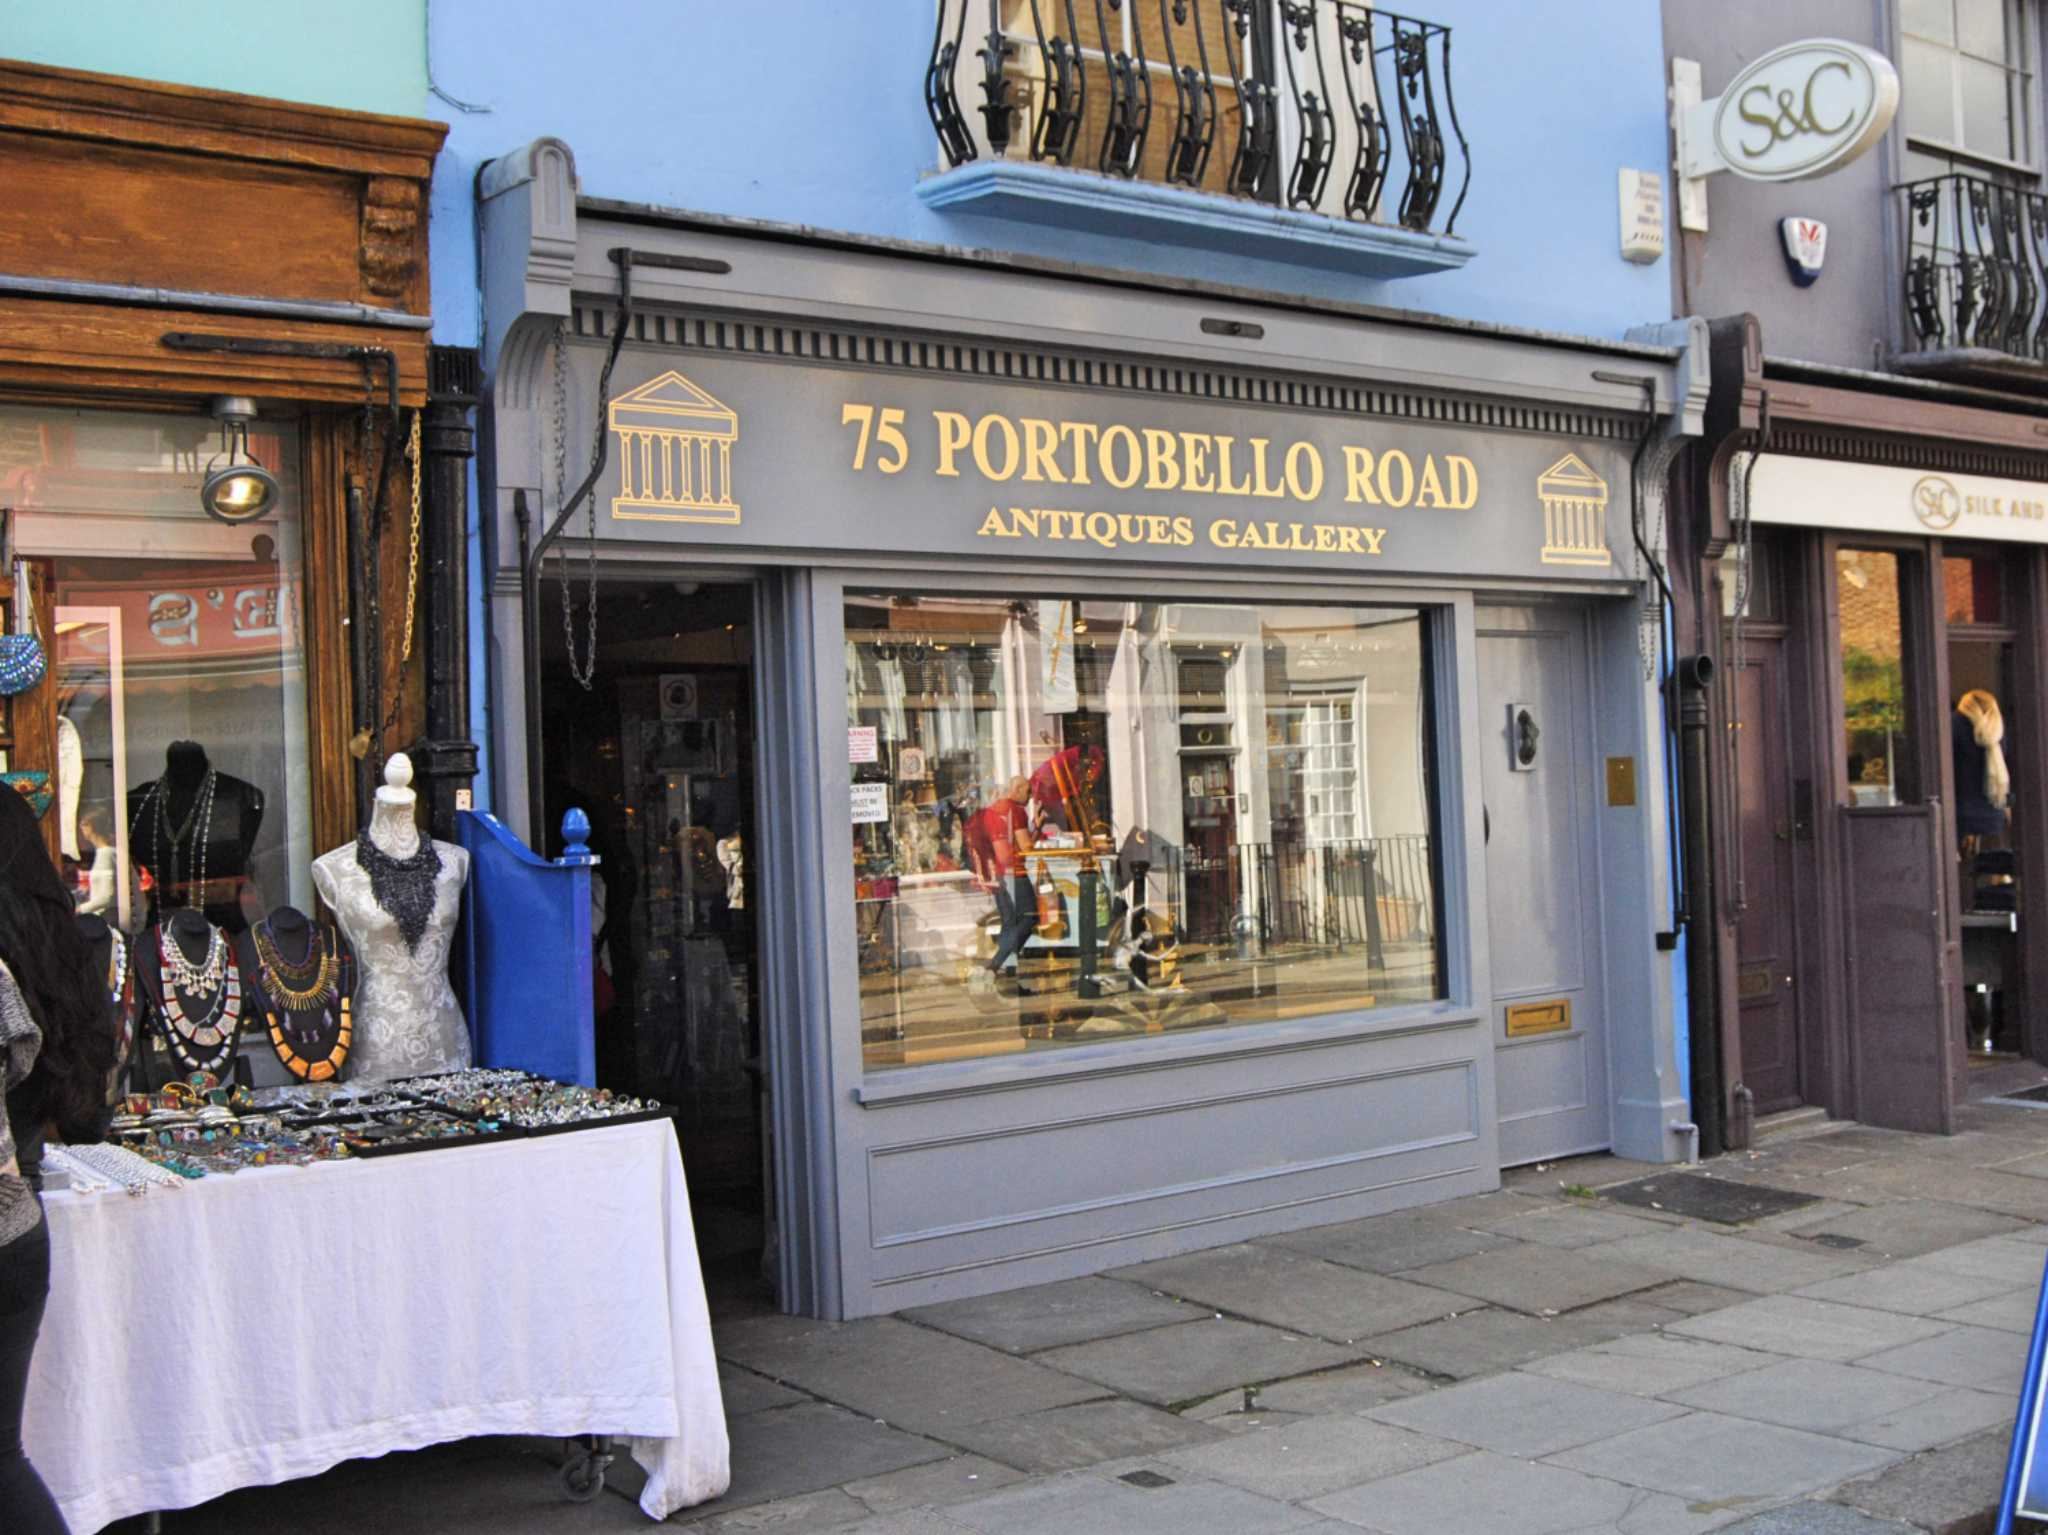 Portobello Road in London. Foto: Nina Härtle